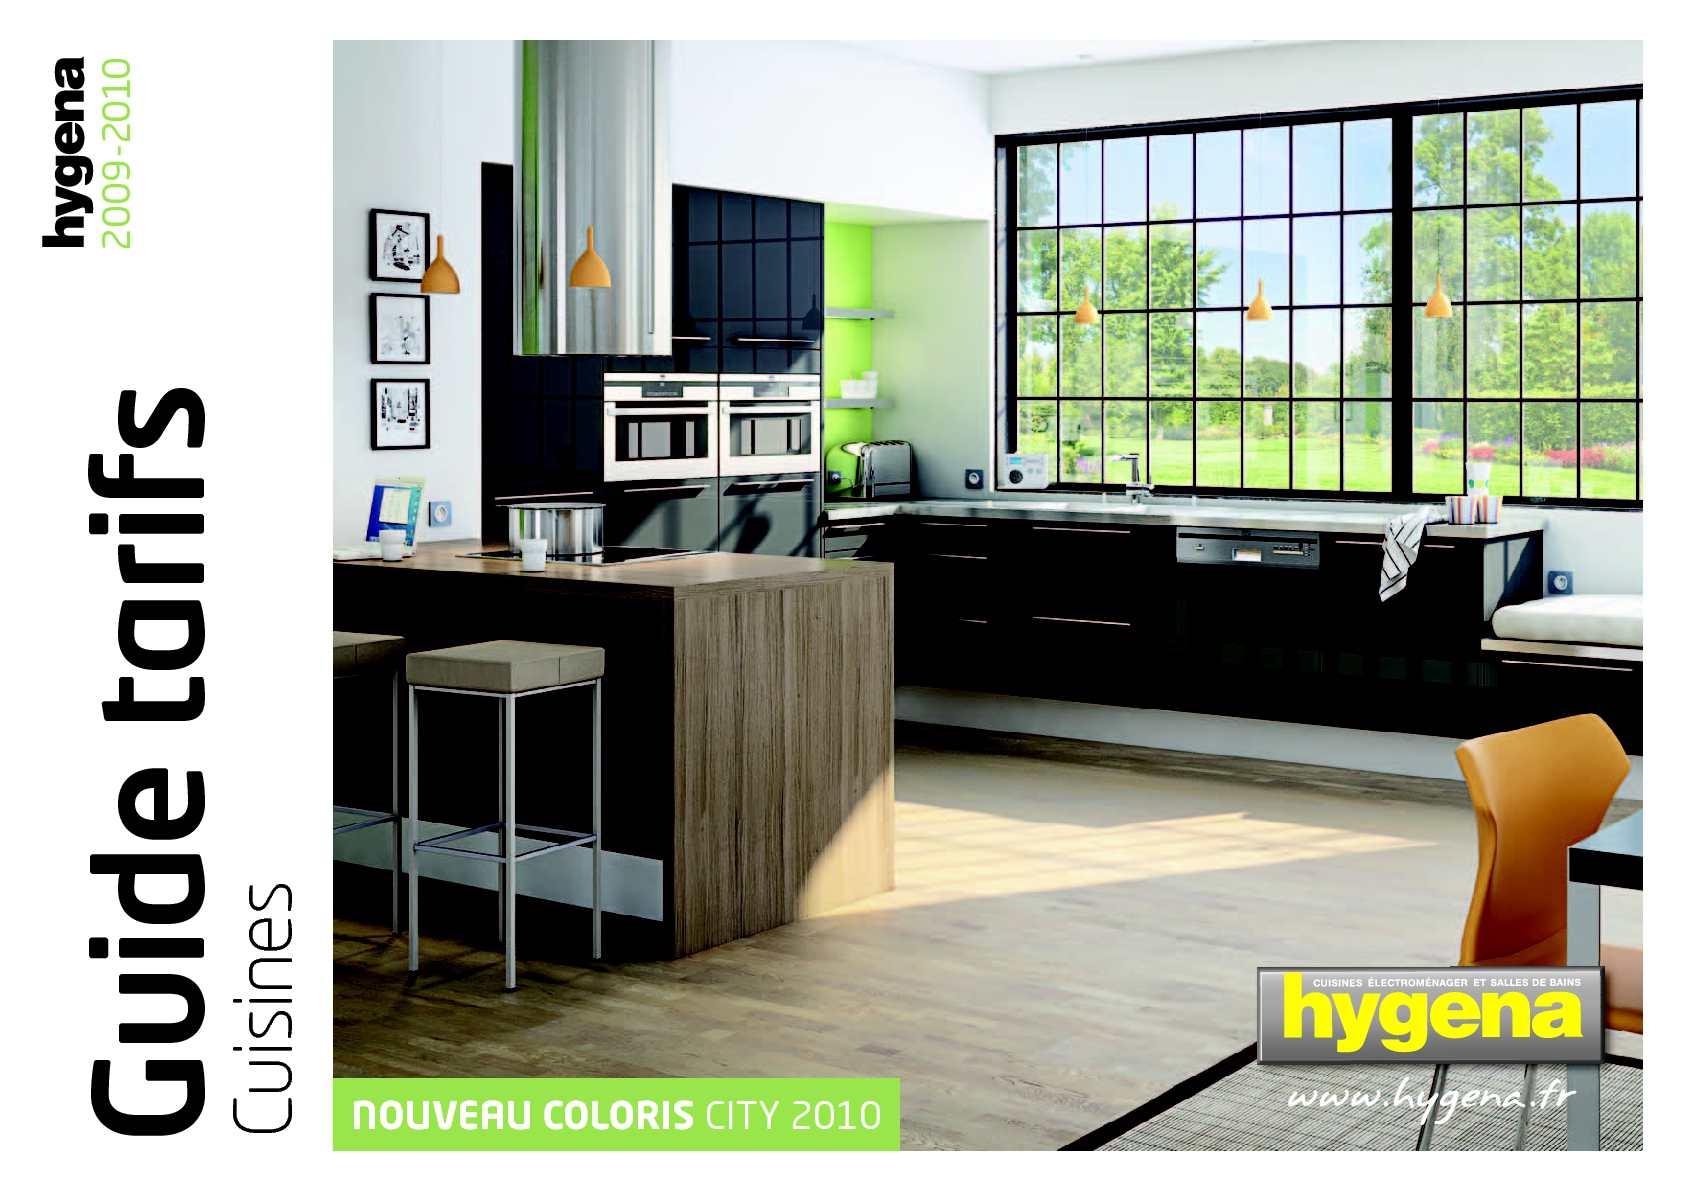 meuble cuisine hygena interesting changer facade cuisine hygena avec r nover une cuisine. Black Bedroom Furniture Sets. Home Design Ideas